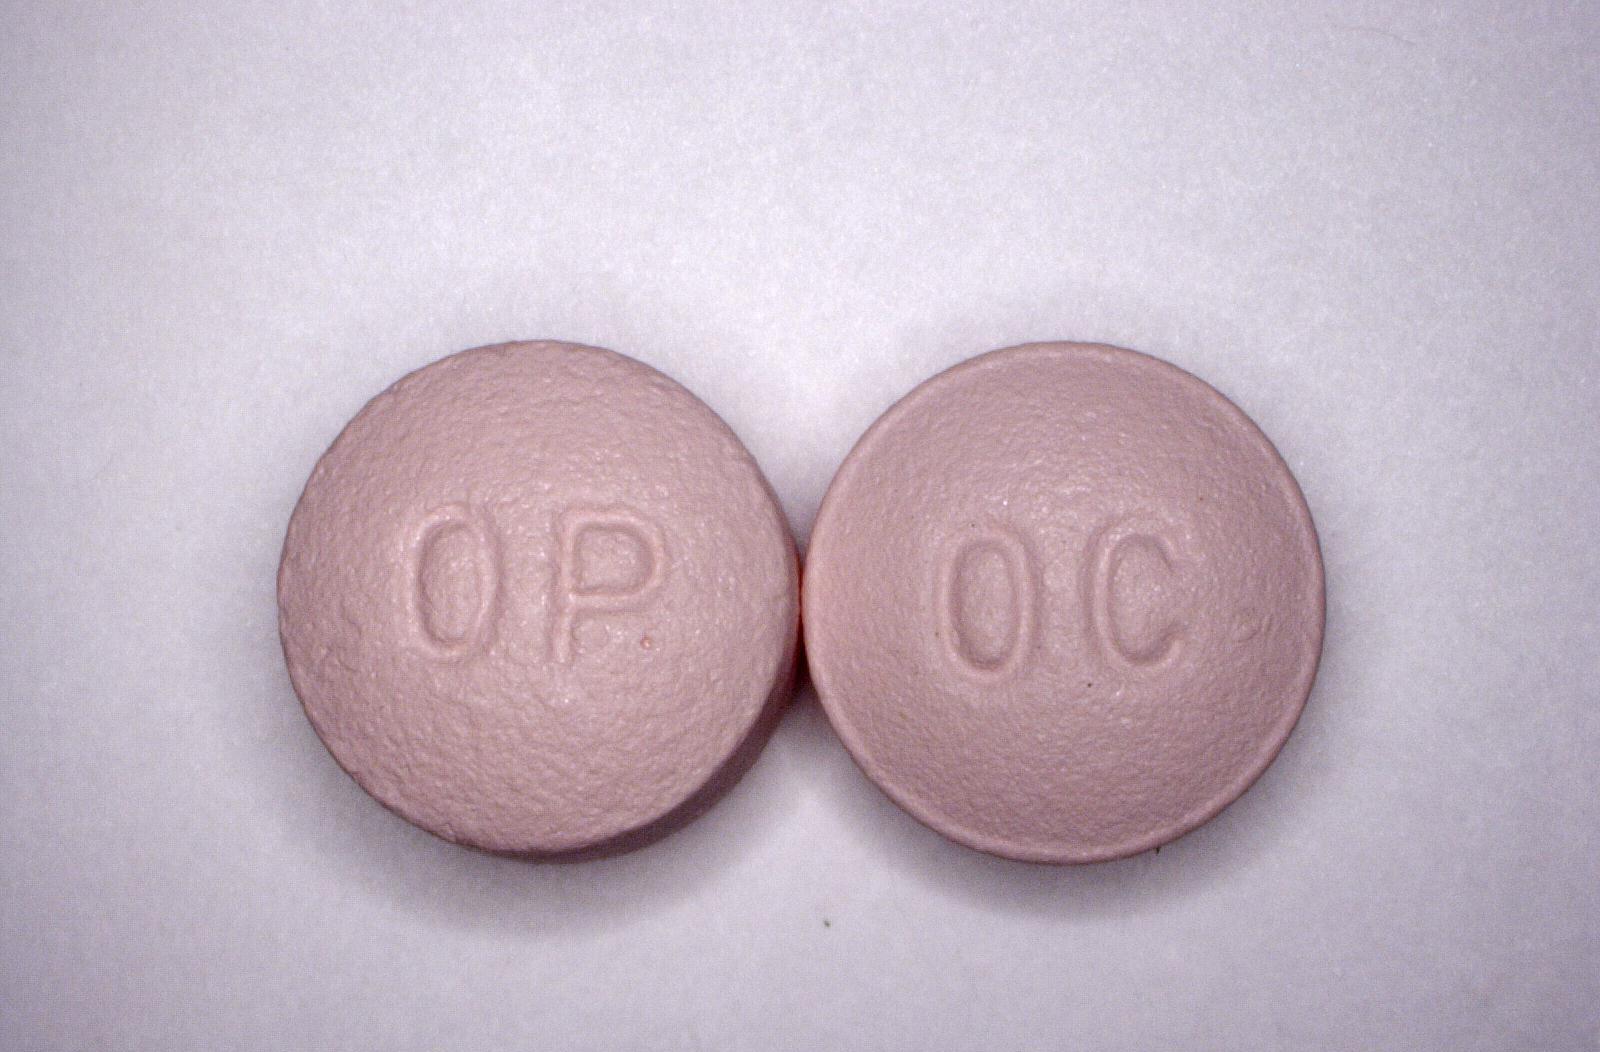 Oxycontin tablets. Photo courtesy of the DEA.